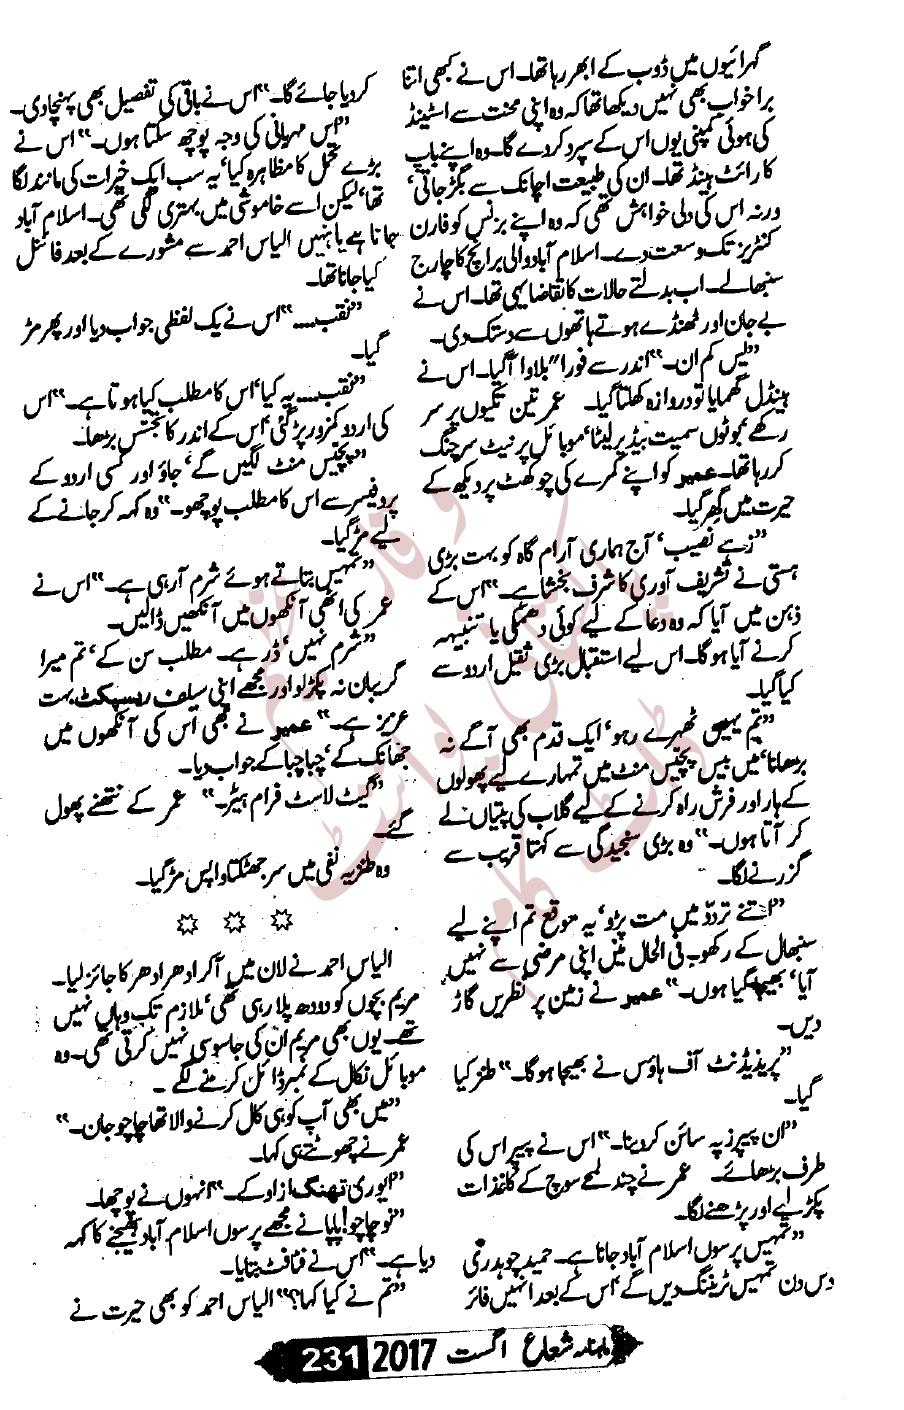 EZ Readings: Sunehri dhoop by Salwa Saif Ullah epi 3